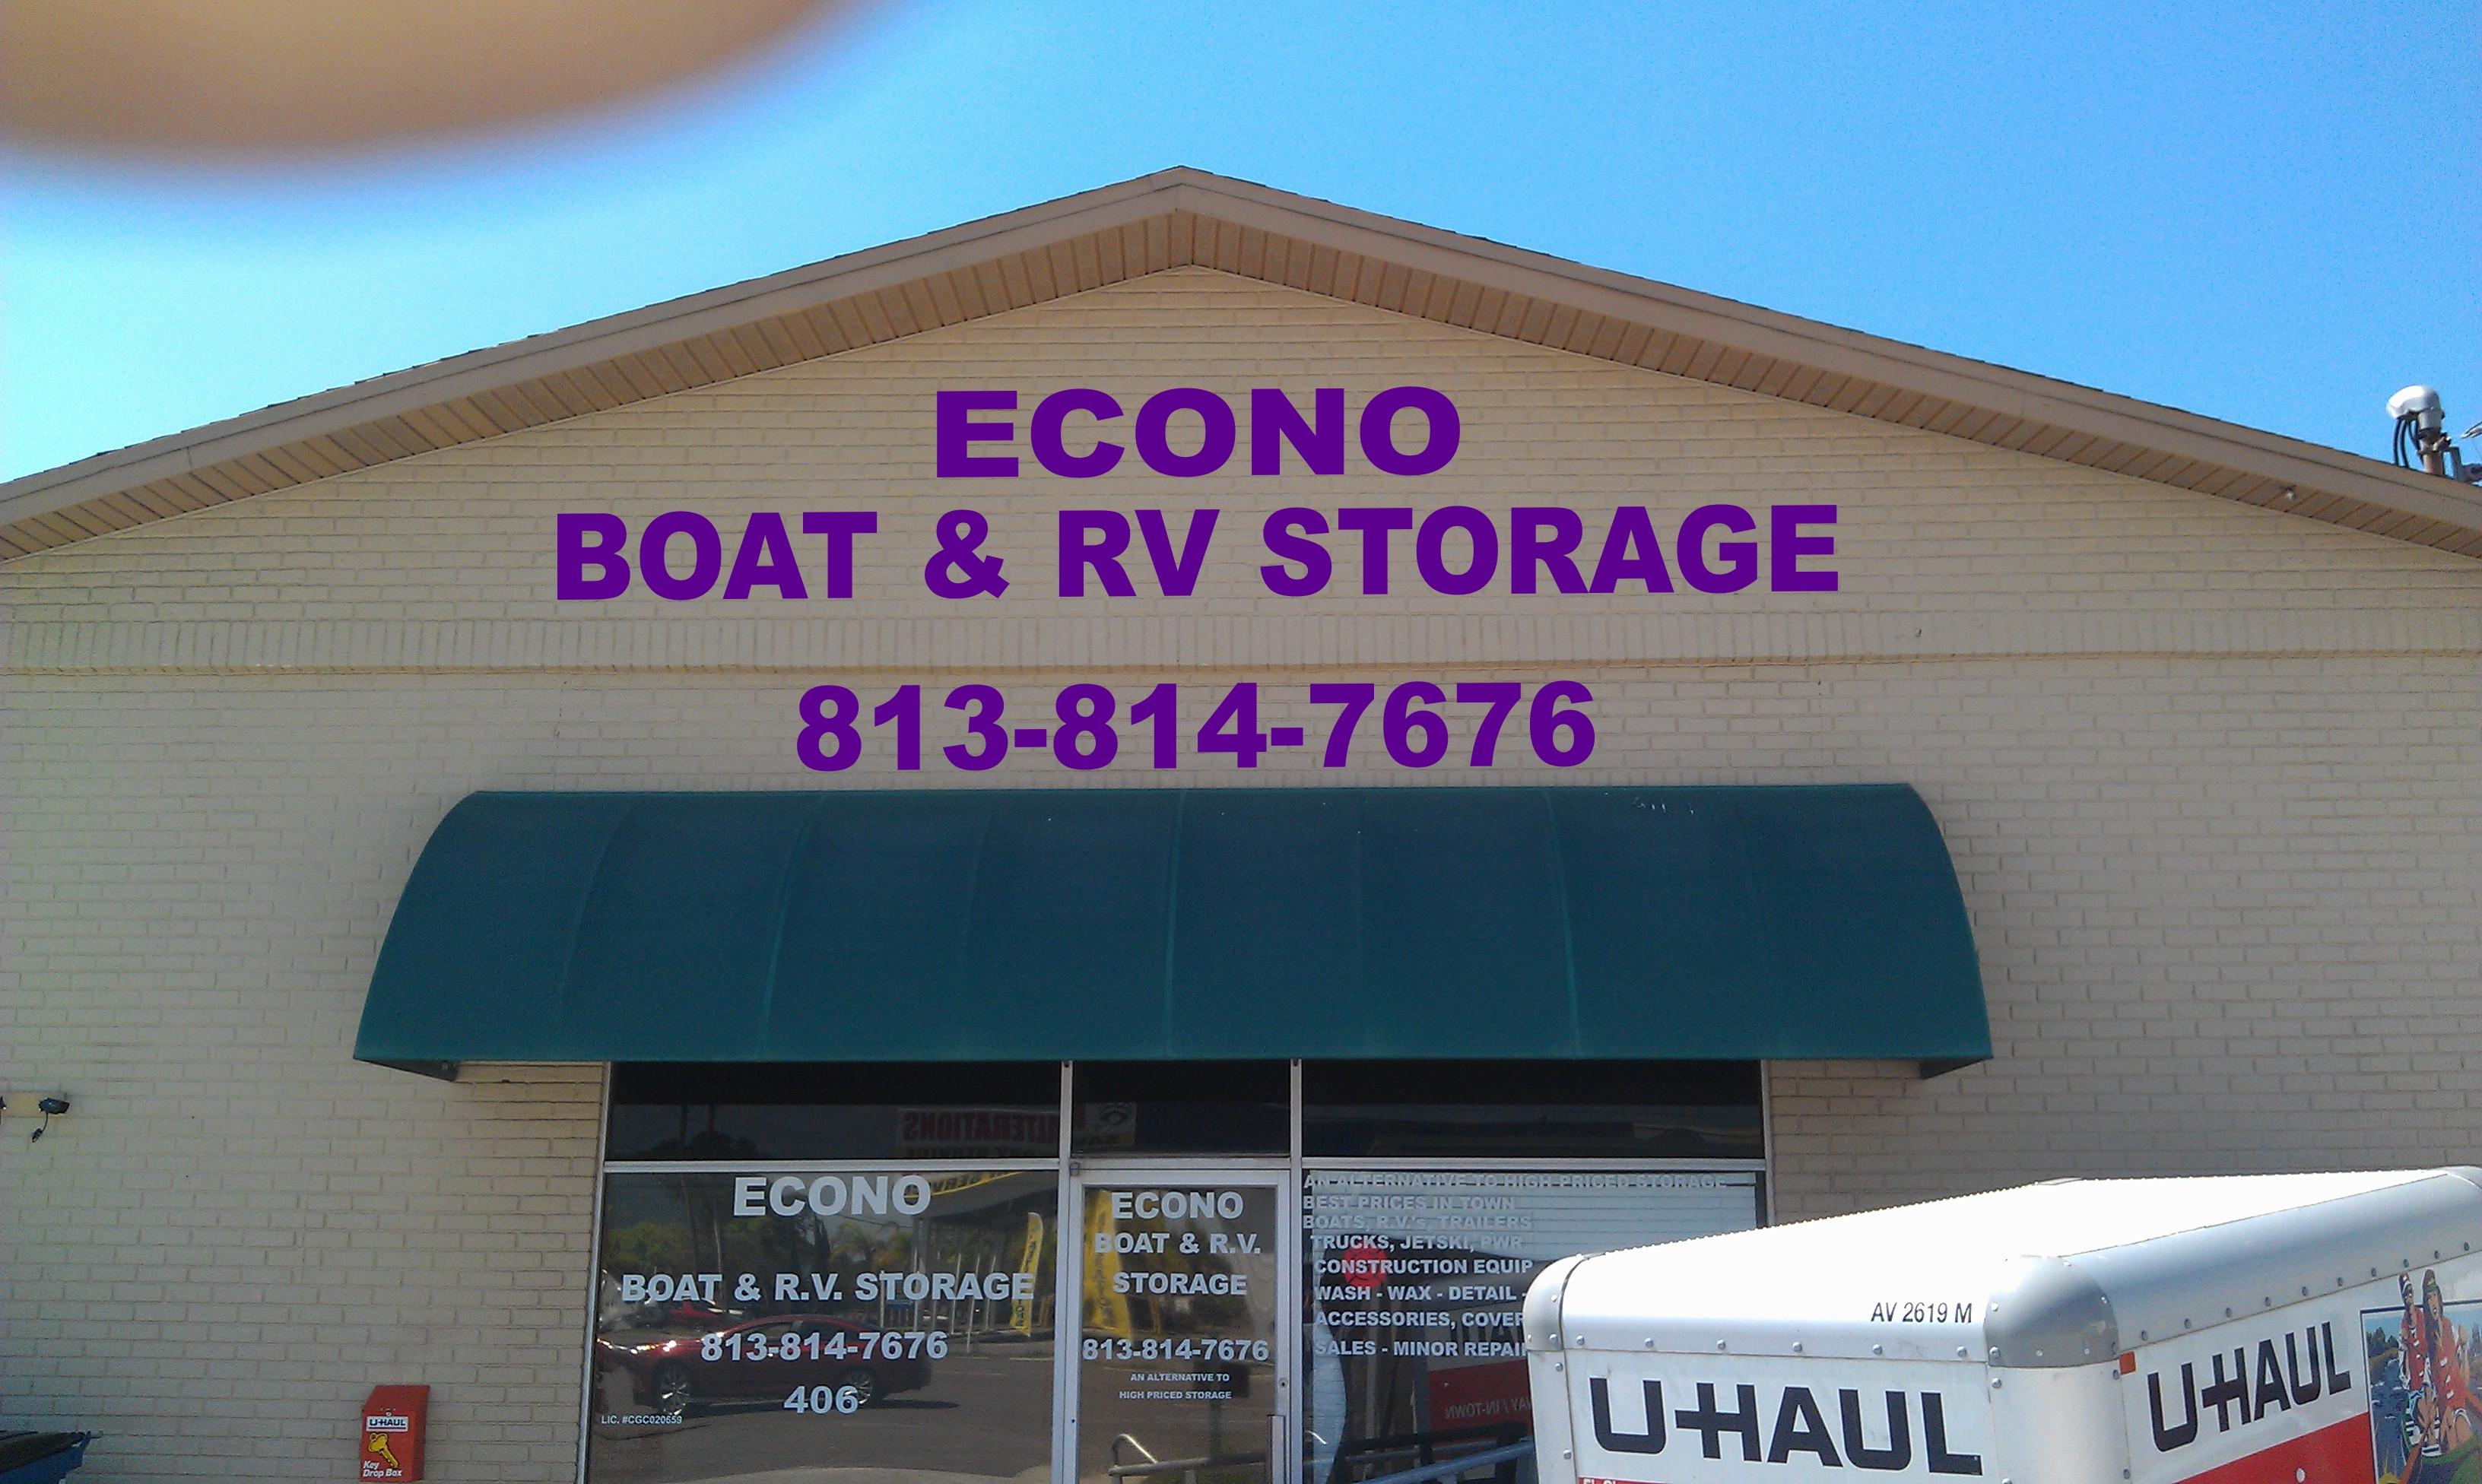 Merveilleux Econo Boat And RV Storage Of Westchase 406 Race Track Rd N, Oldsmar, FL  34677   YP.com